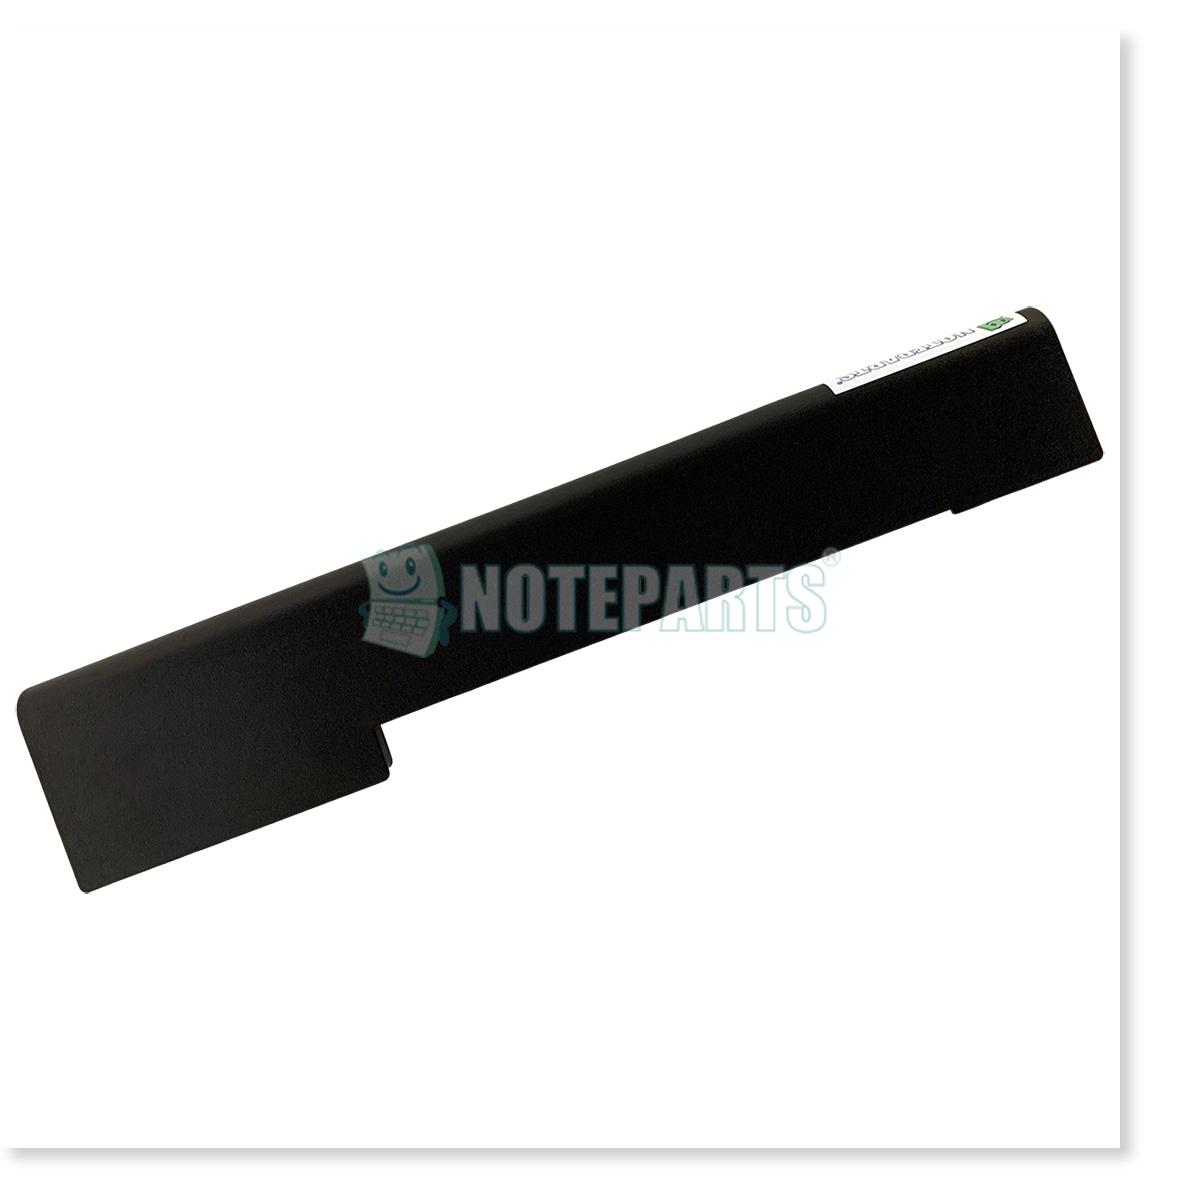 HP EliteBook 8560w 8570w 8760w 8セル バッテリー QK641AA VH08 632425-001対応